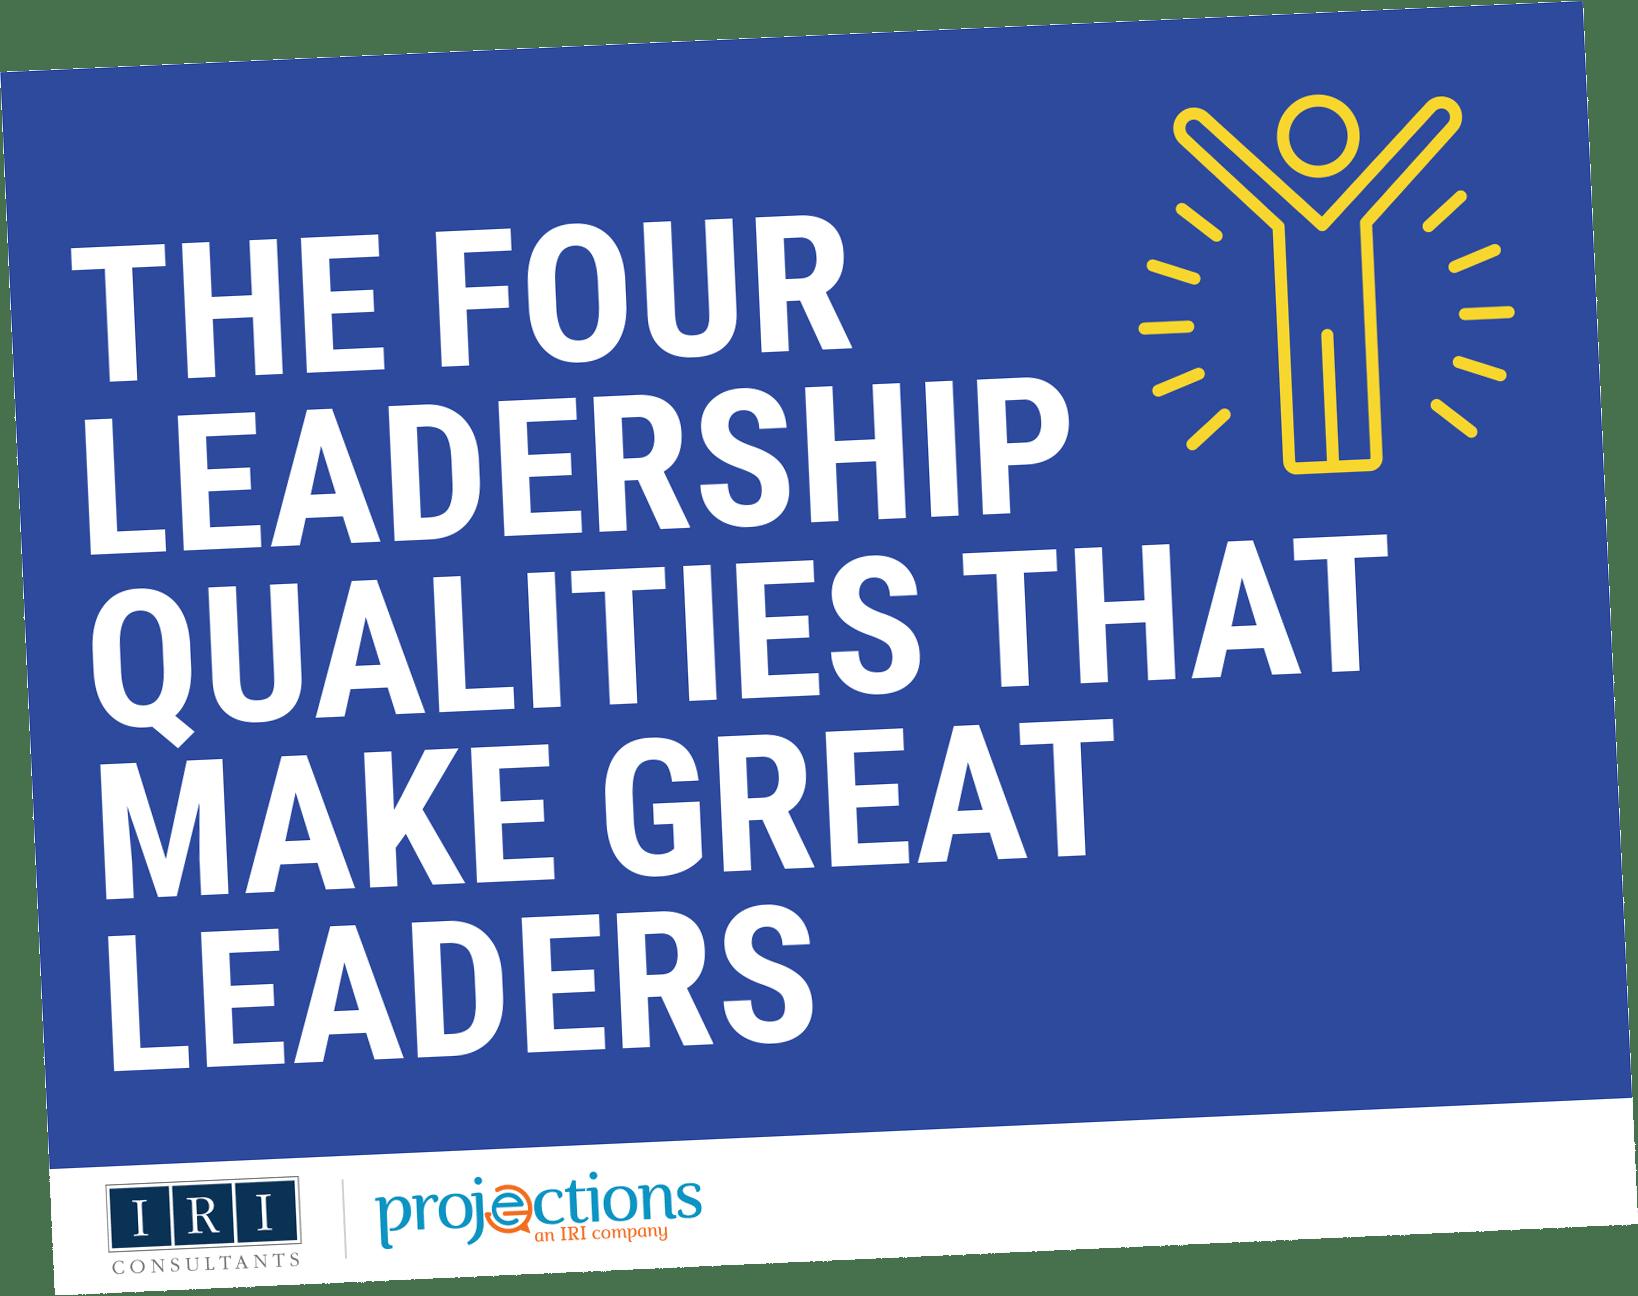 Qualities That Make Great Leaders